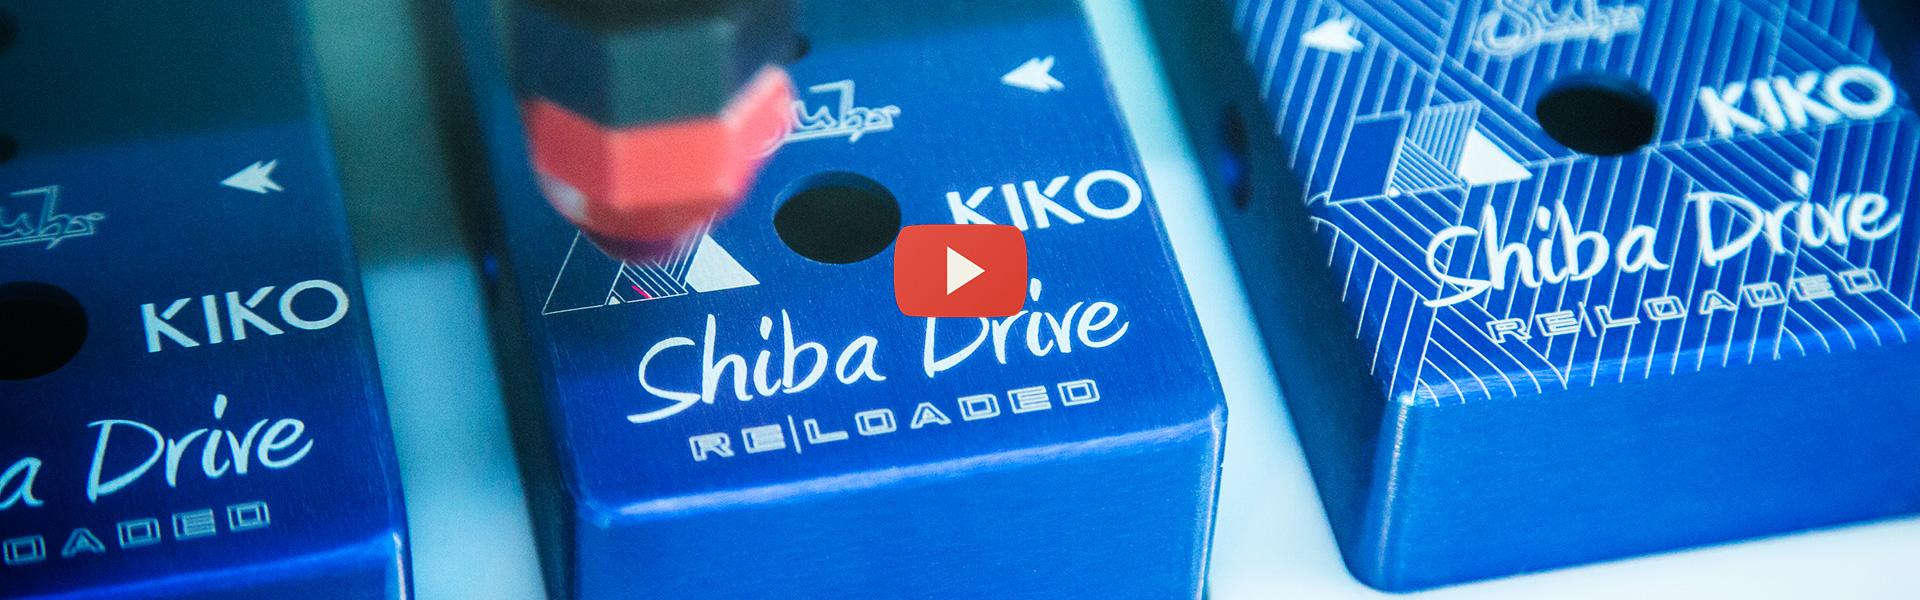 Kiko Loureiro Signature Shiba Drive Video